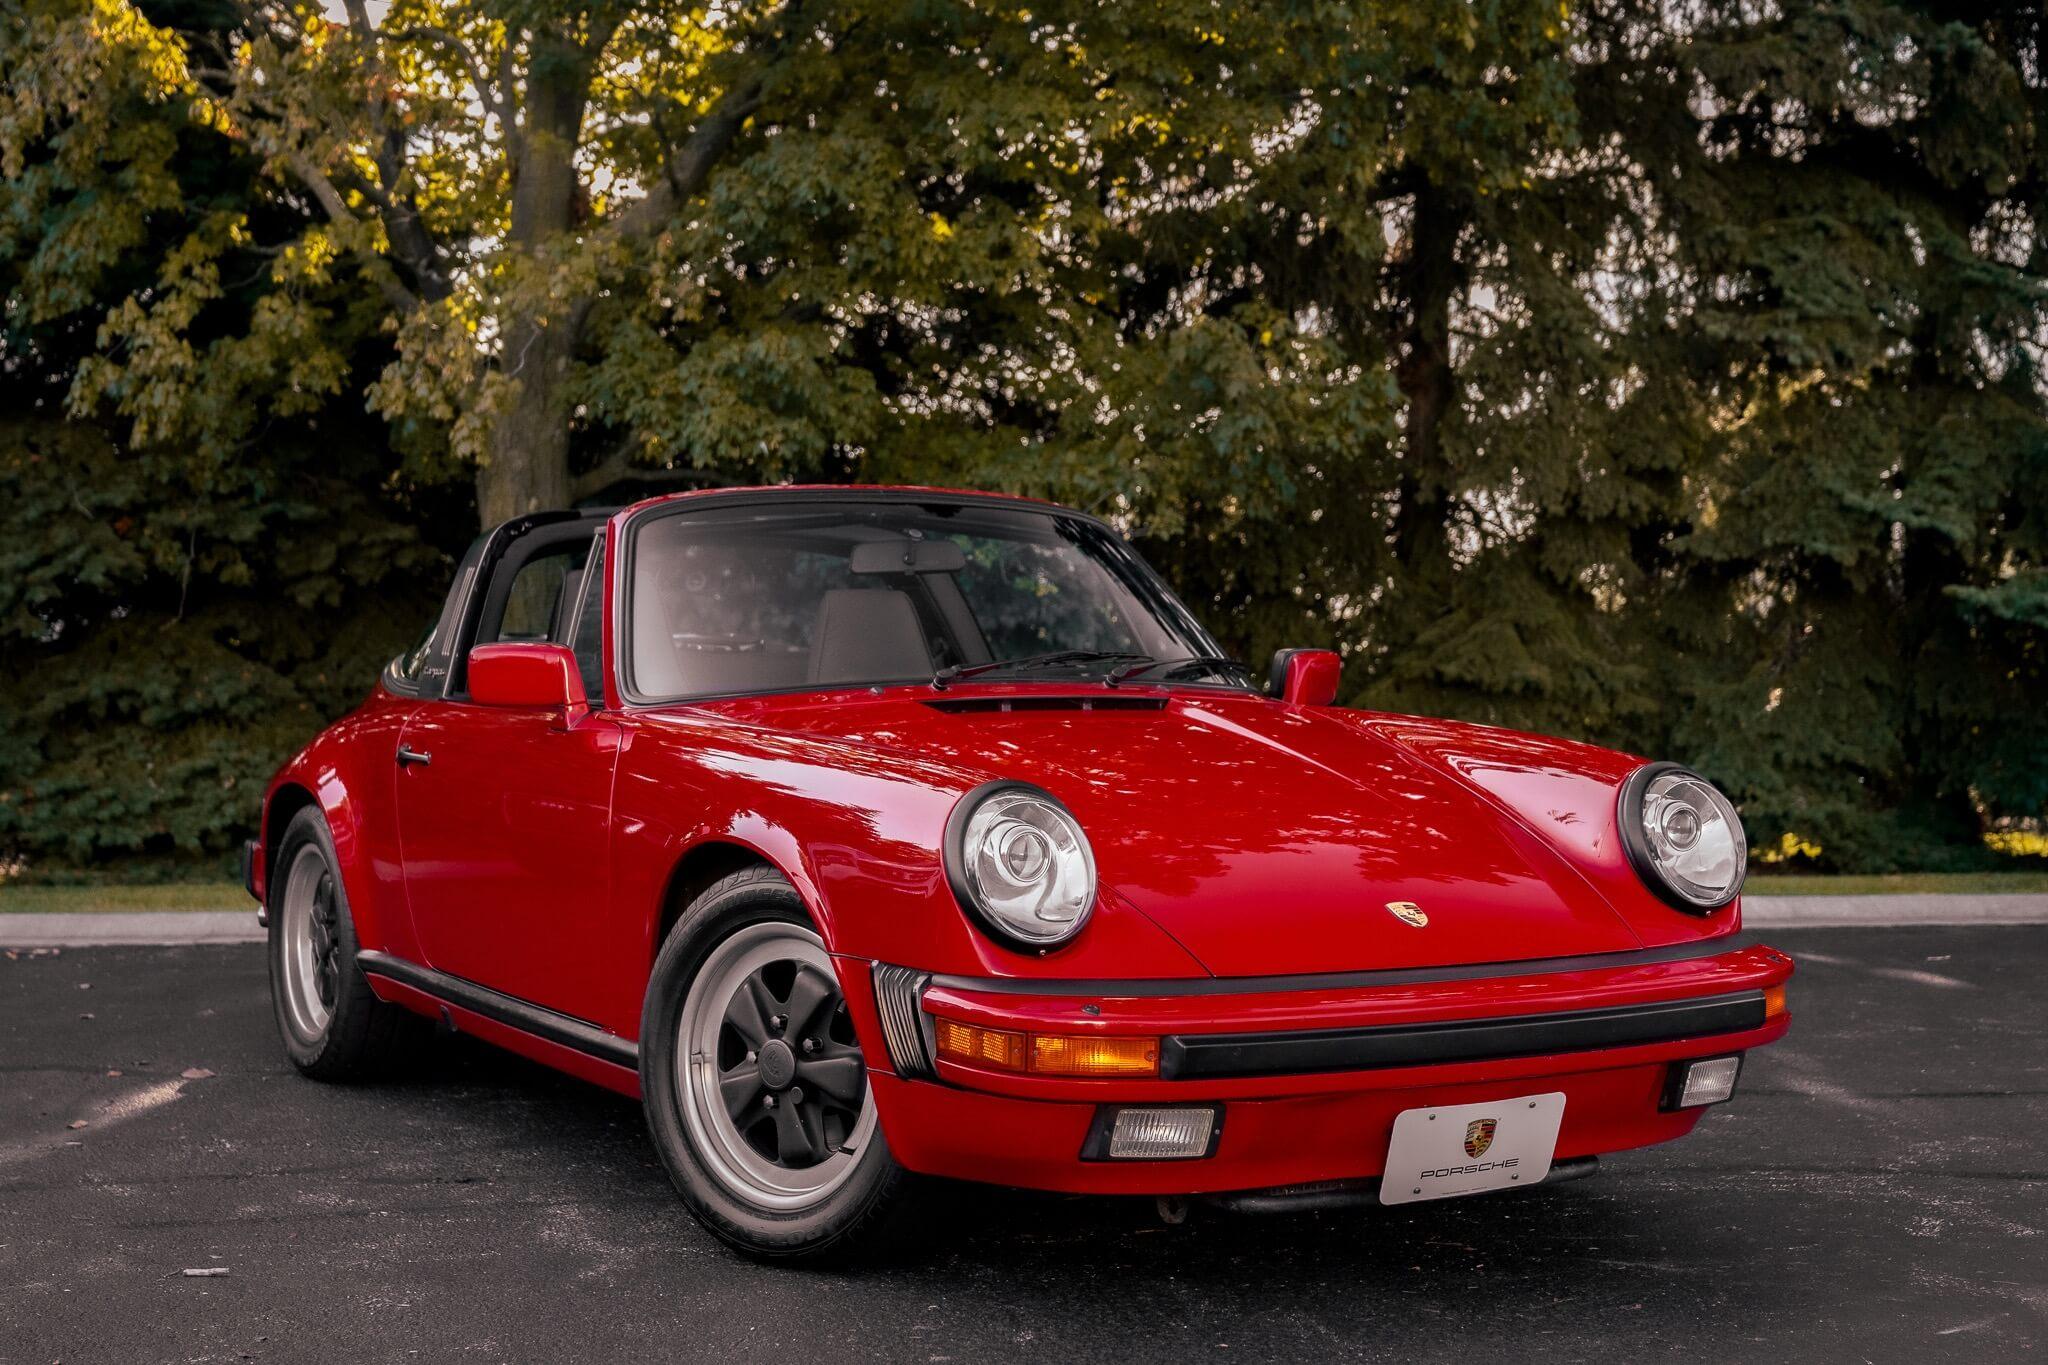 DT: 1985 Porsche 911 Carrera Targa 5-Speed